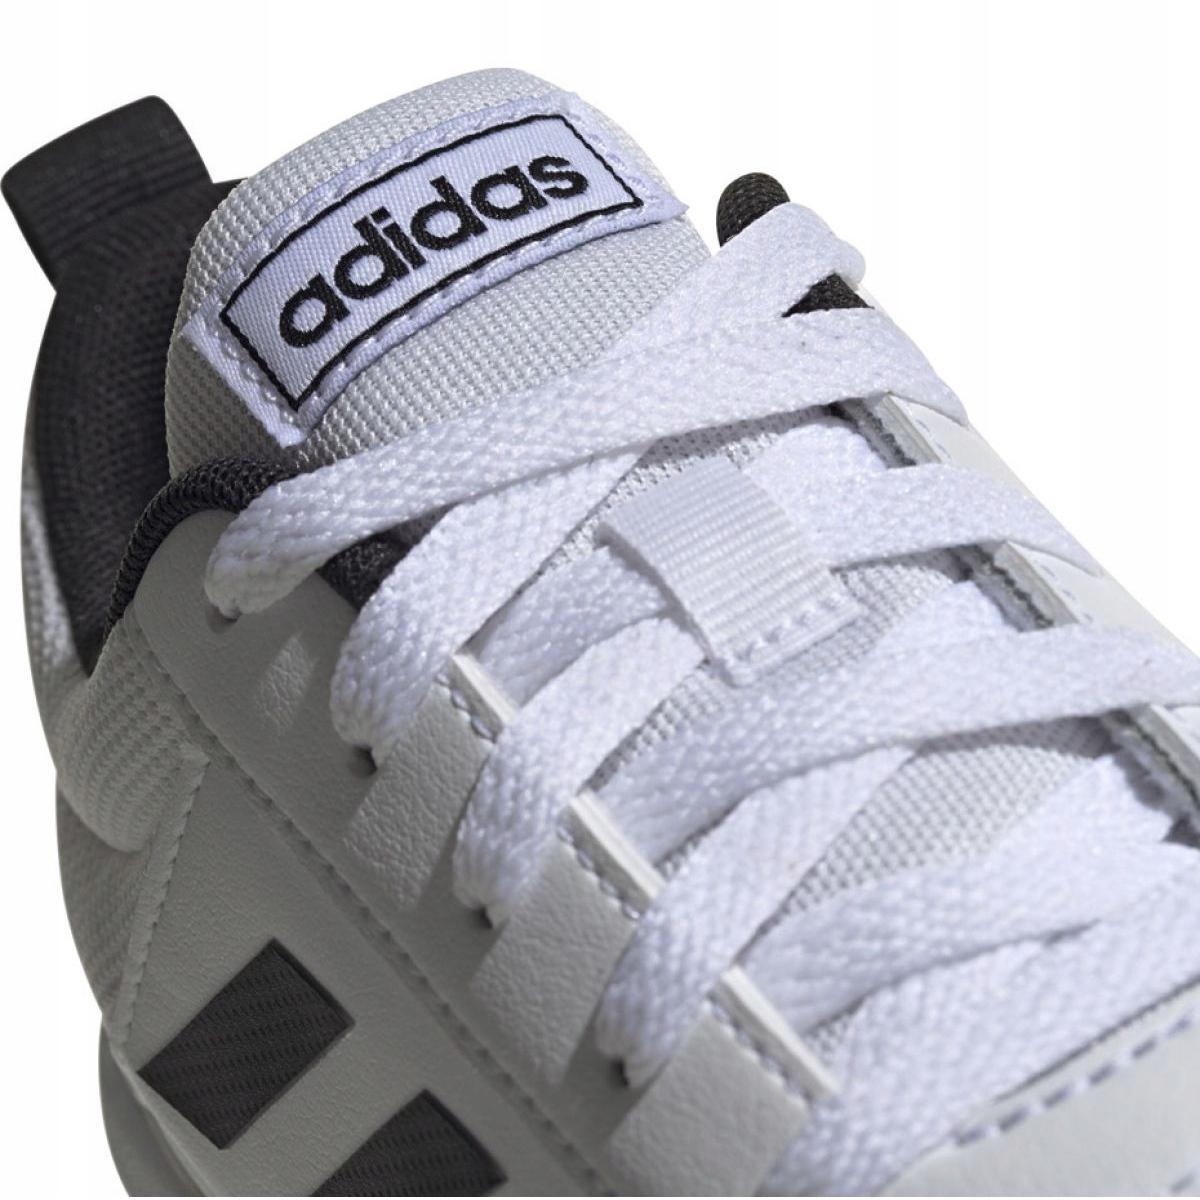 Sapatilhas Adidas Tensaur K Jr. EF1085 branco